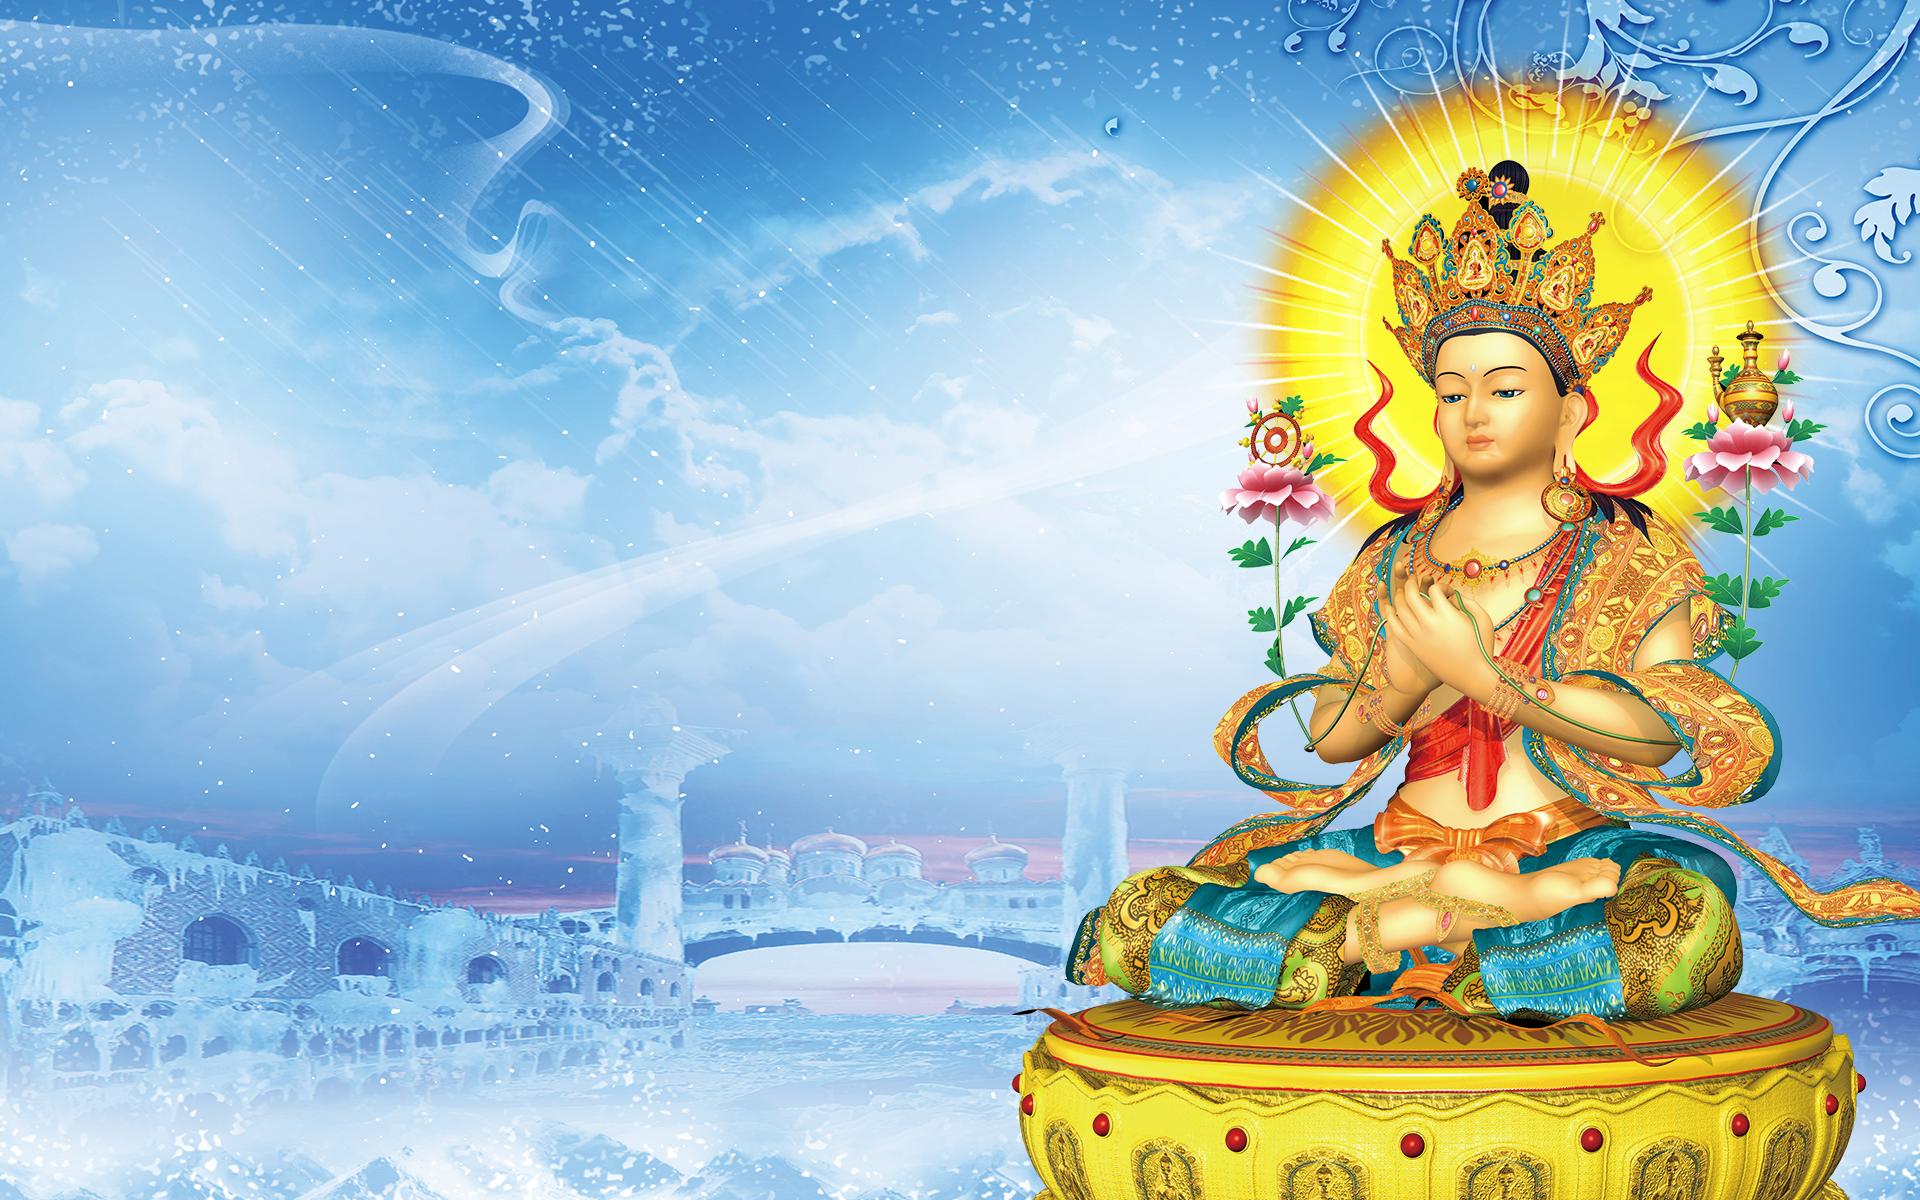 Bodhisattva Maitreya Kumpulan Ajaran Sang Buddha Untuk